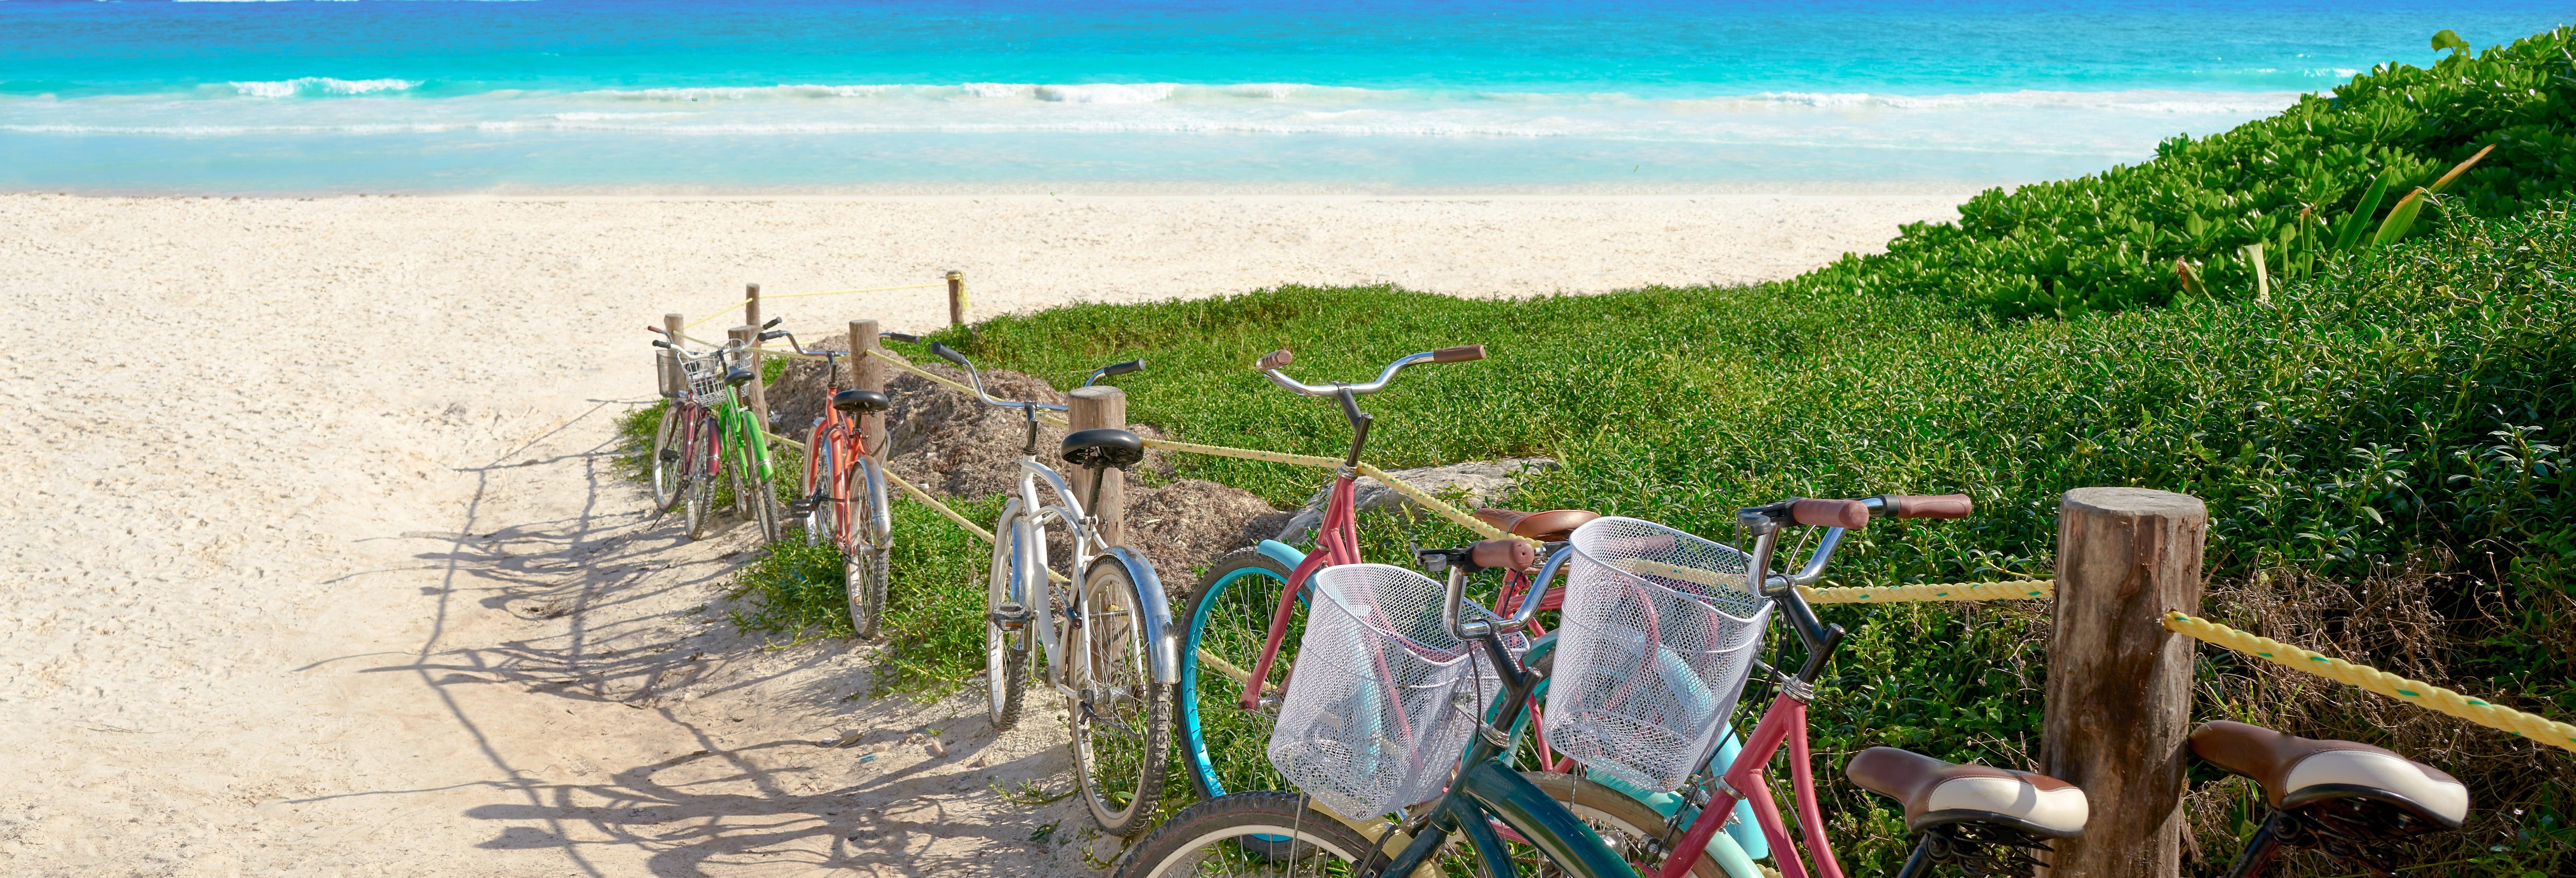 Tour en bicicleta por Riviera Maya